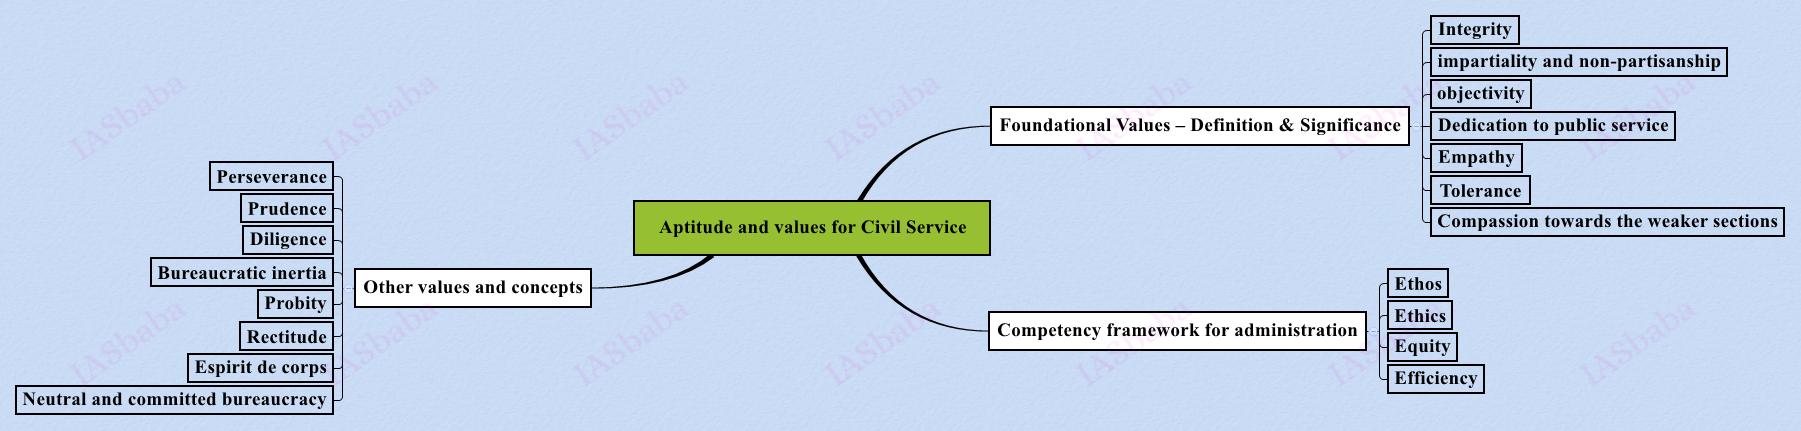 Aptitude and values for Civil Service